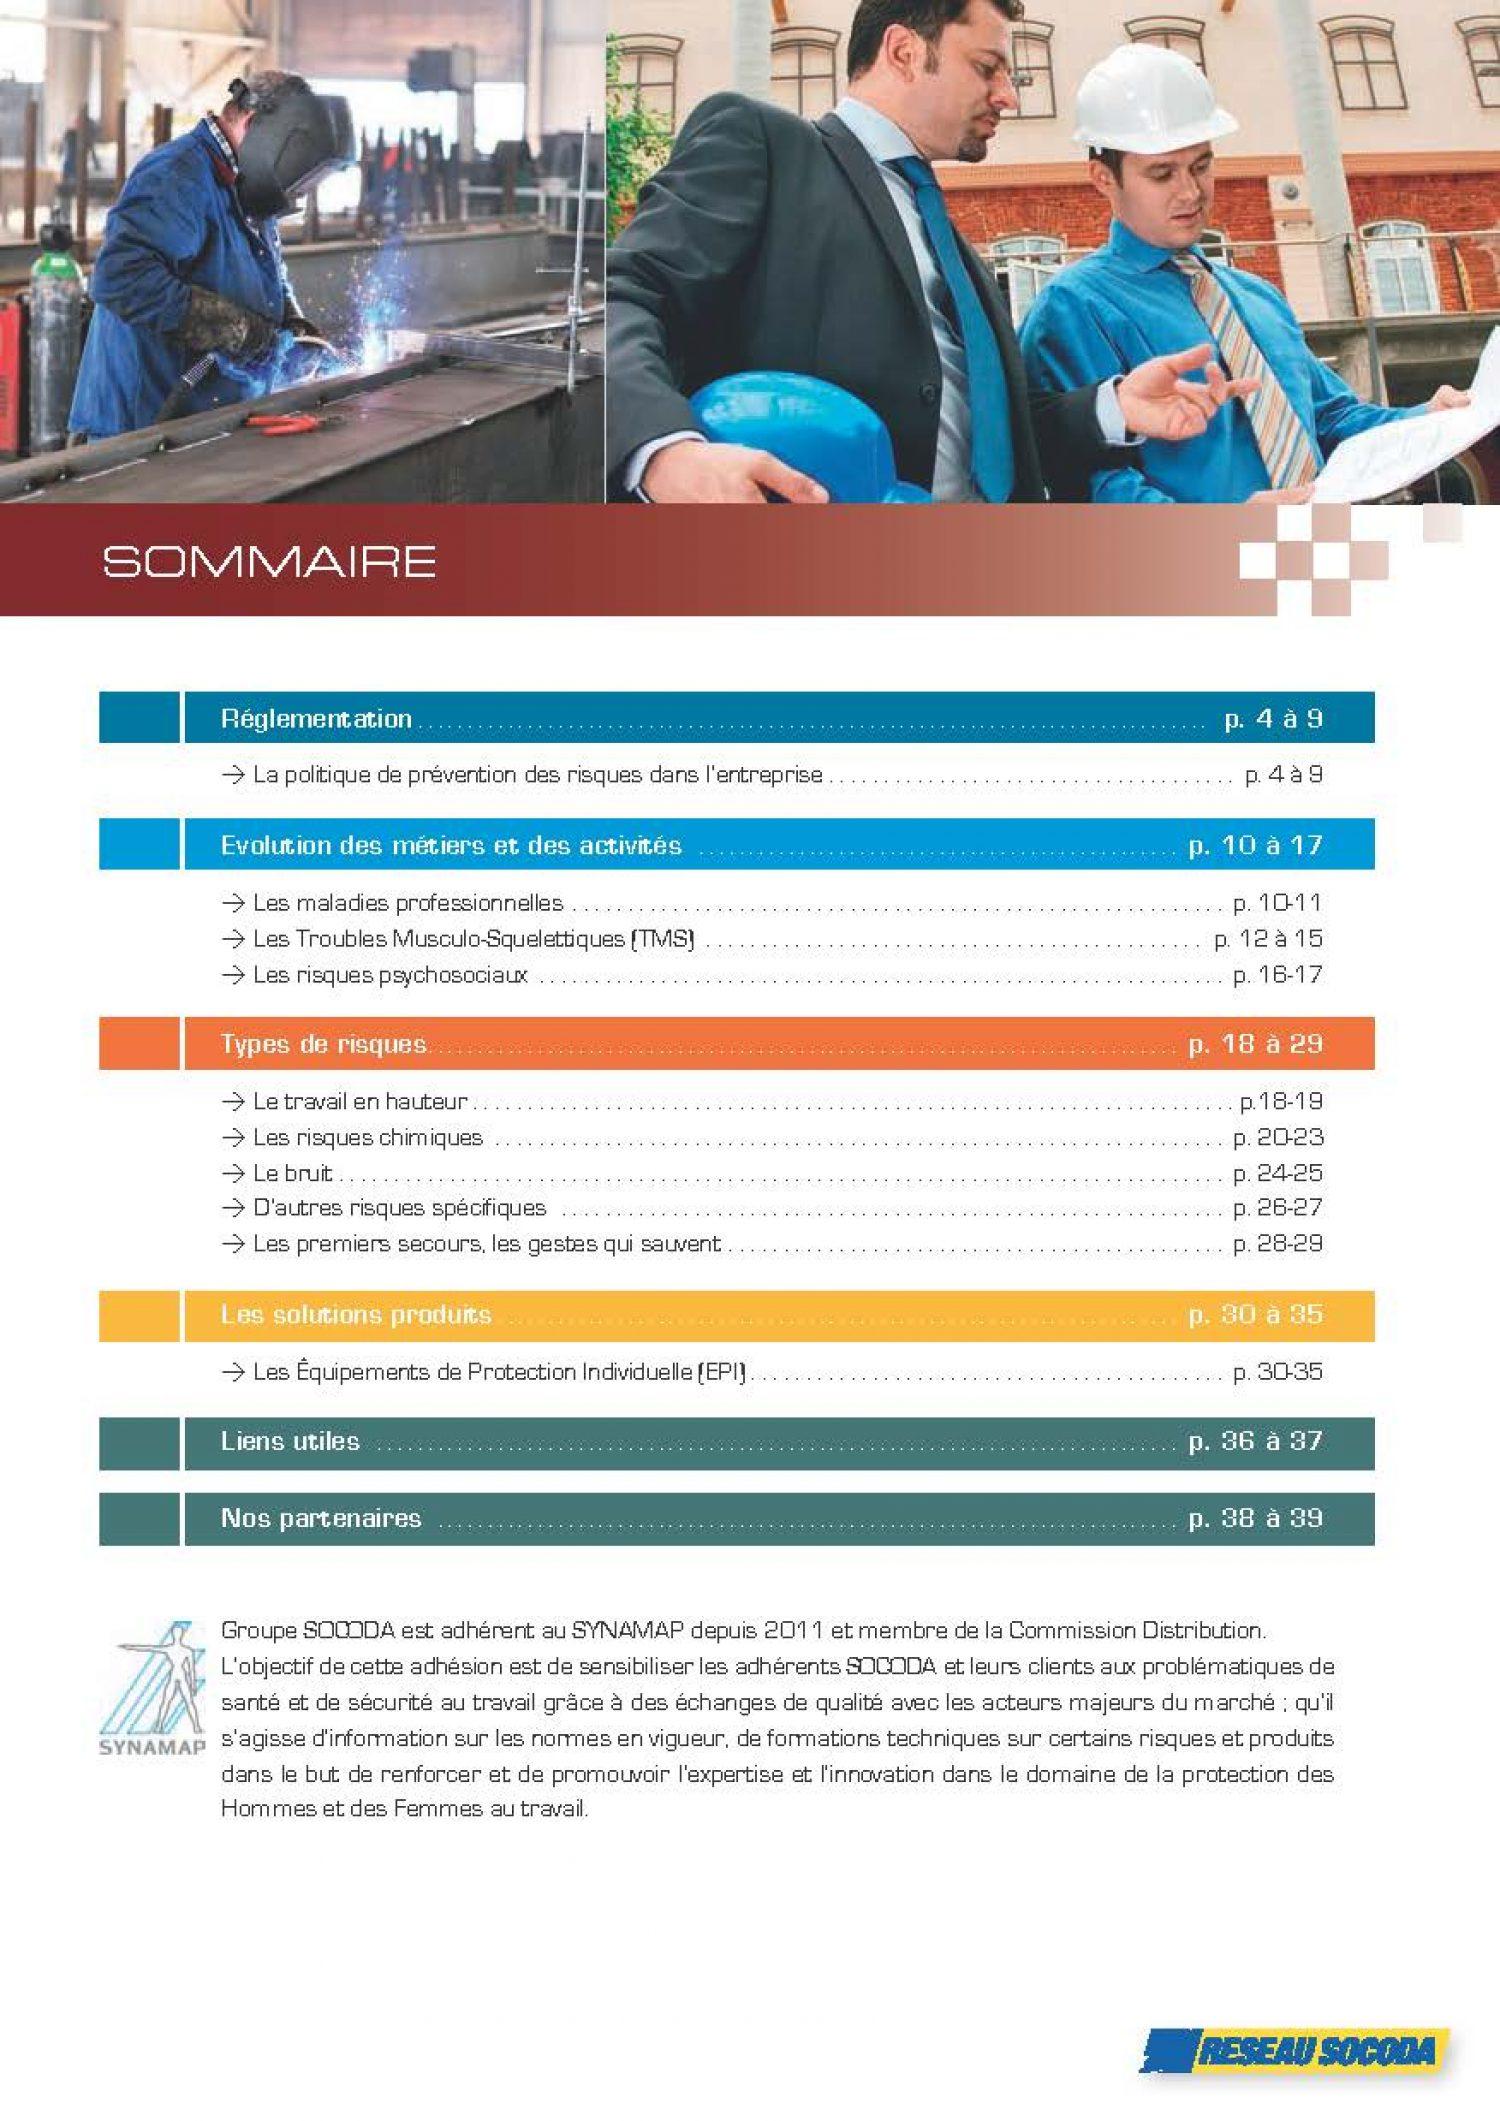 Guide Securite au Travail 2014 HDpdf_Page_03